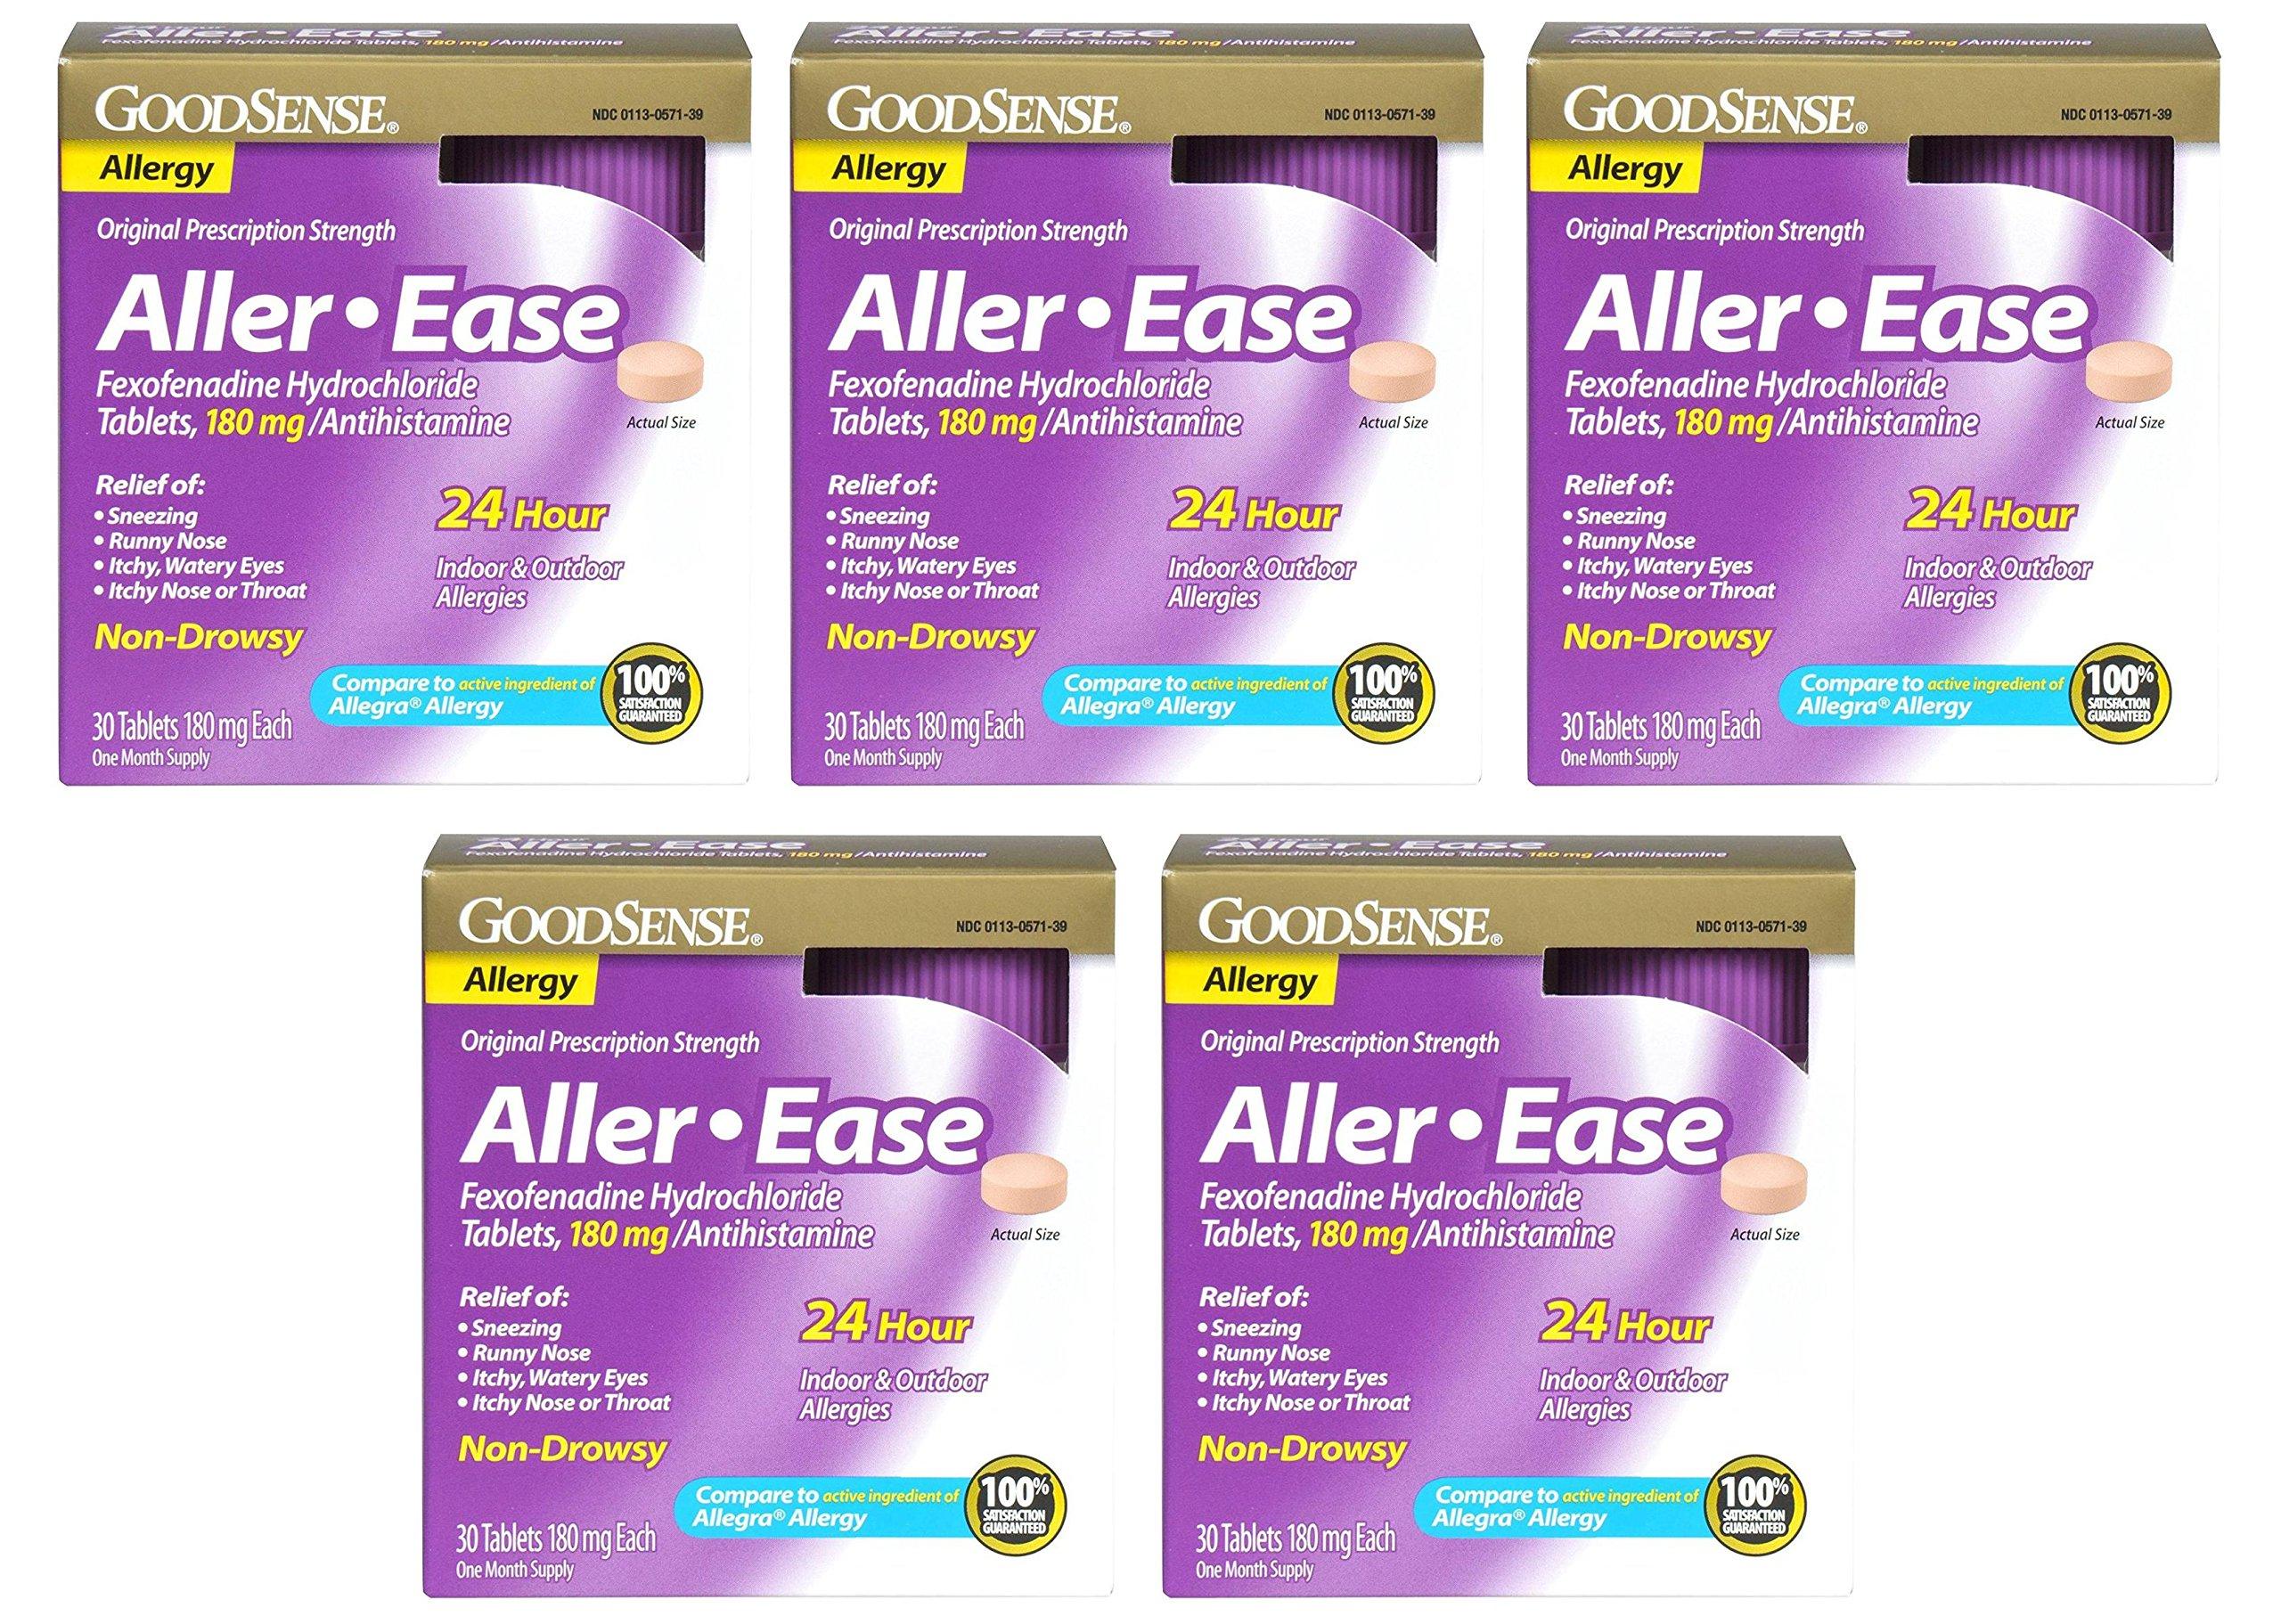 GoodSense Aller-Ease BZvDB Fexofenadine Hydrochloride Tablets, 180 mg/Antihistamine, 30 Count (5 Pack)